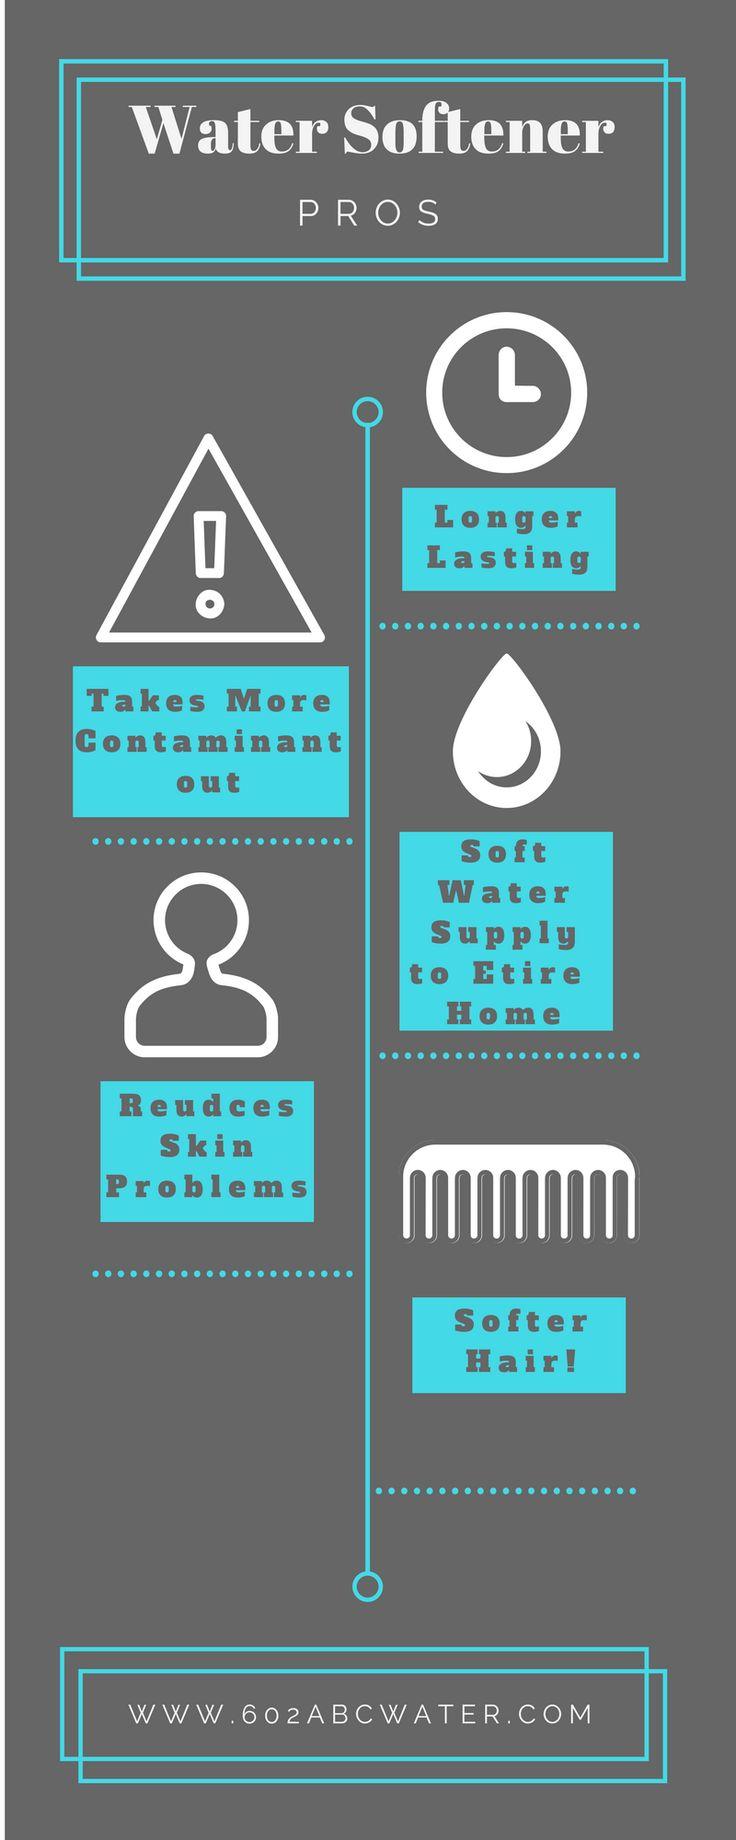 Shower Head Filters Vs Water Softeners